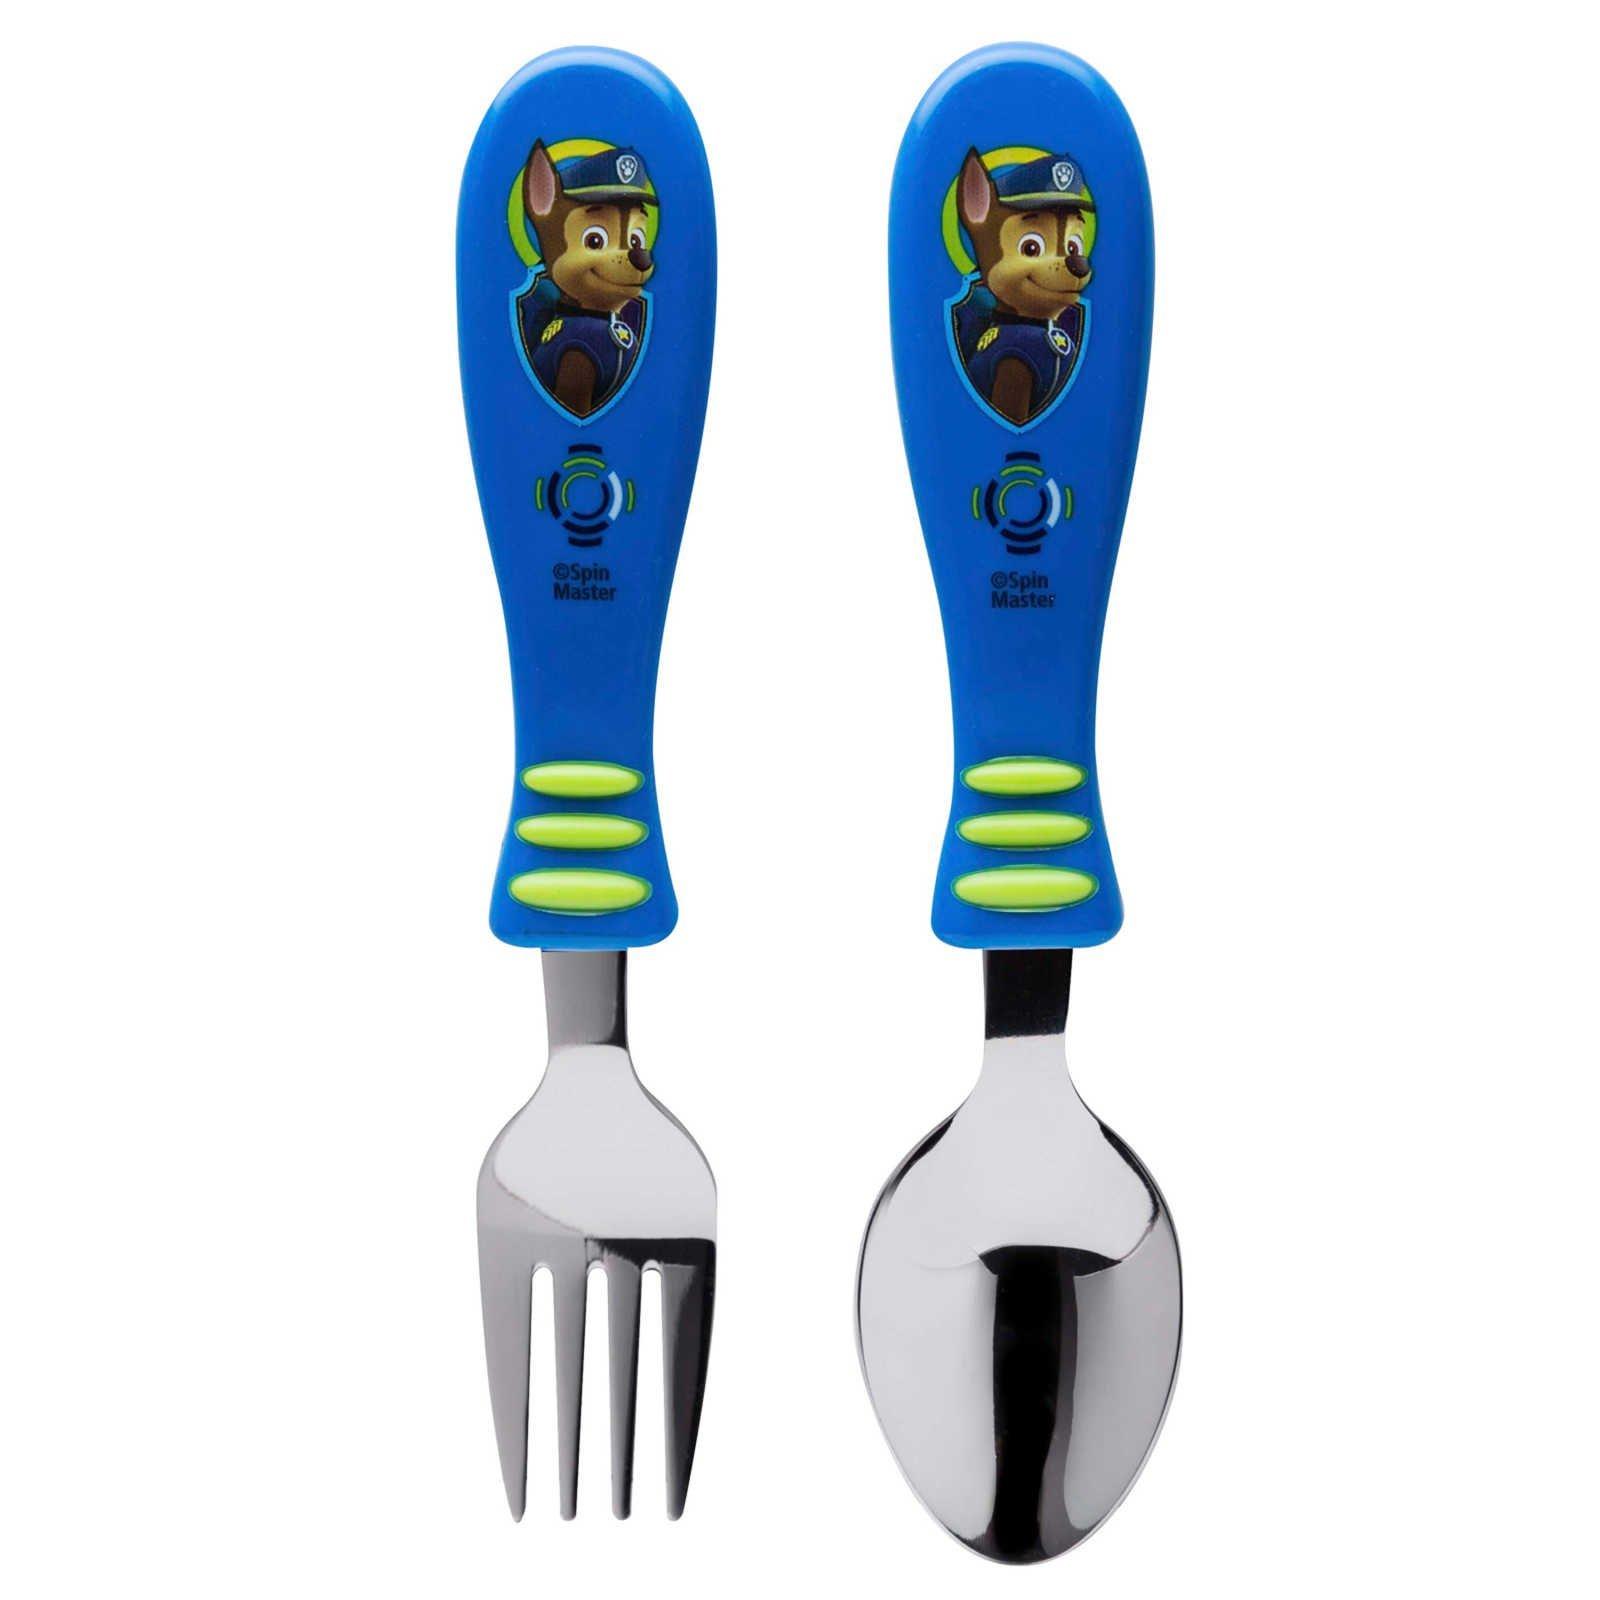 Zak Designs Paw Patrol Fork and Spoon Set, Marshall